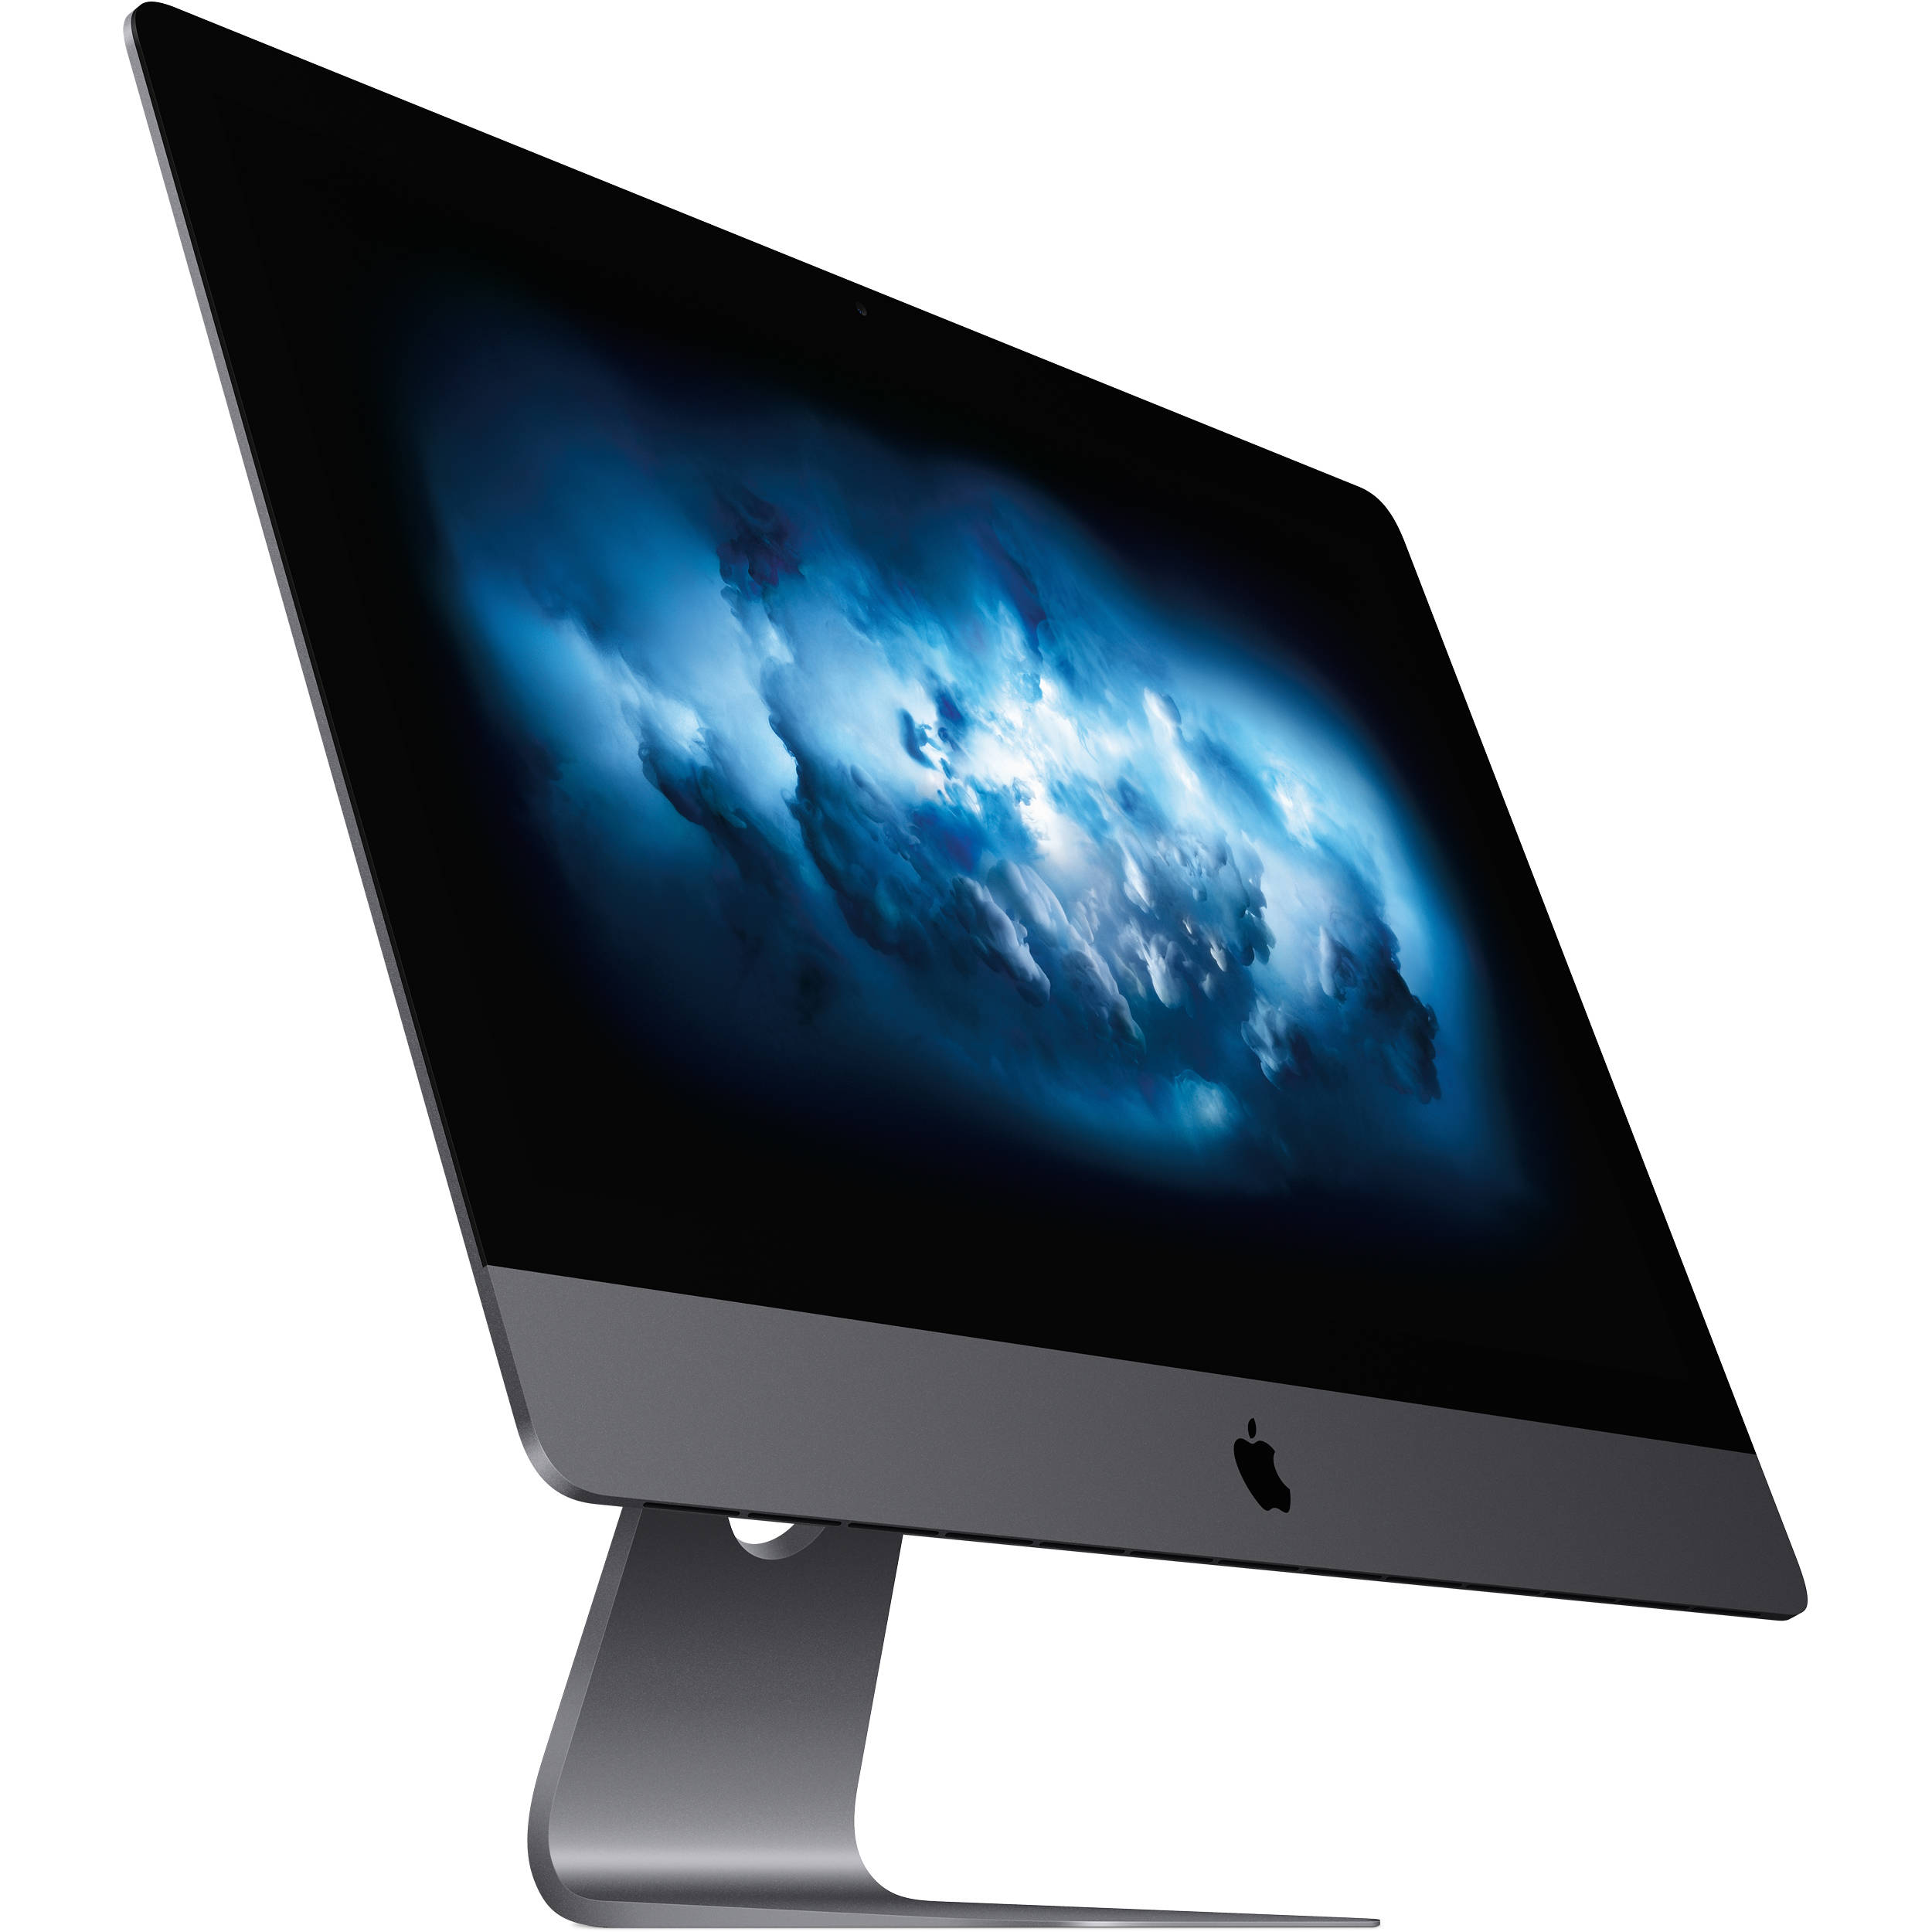 Imaschine for computer